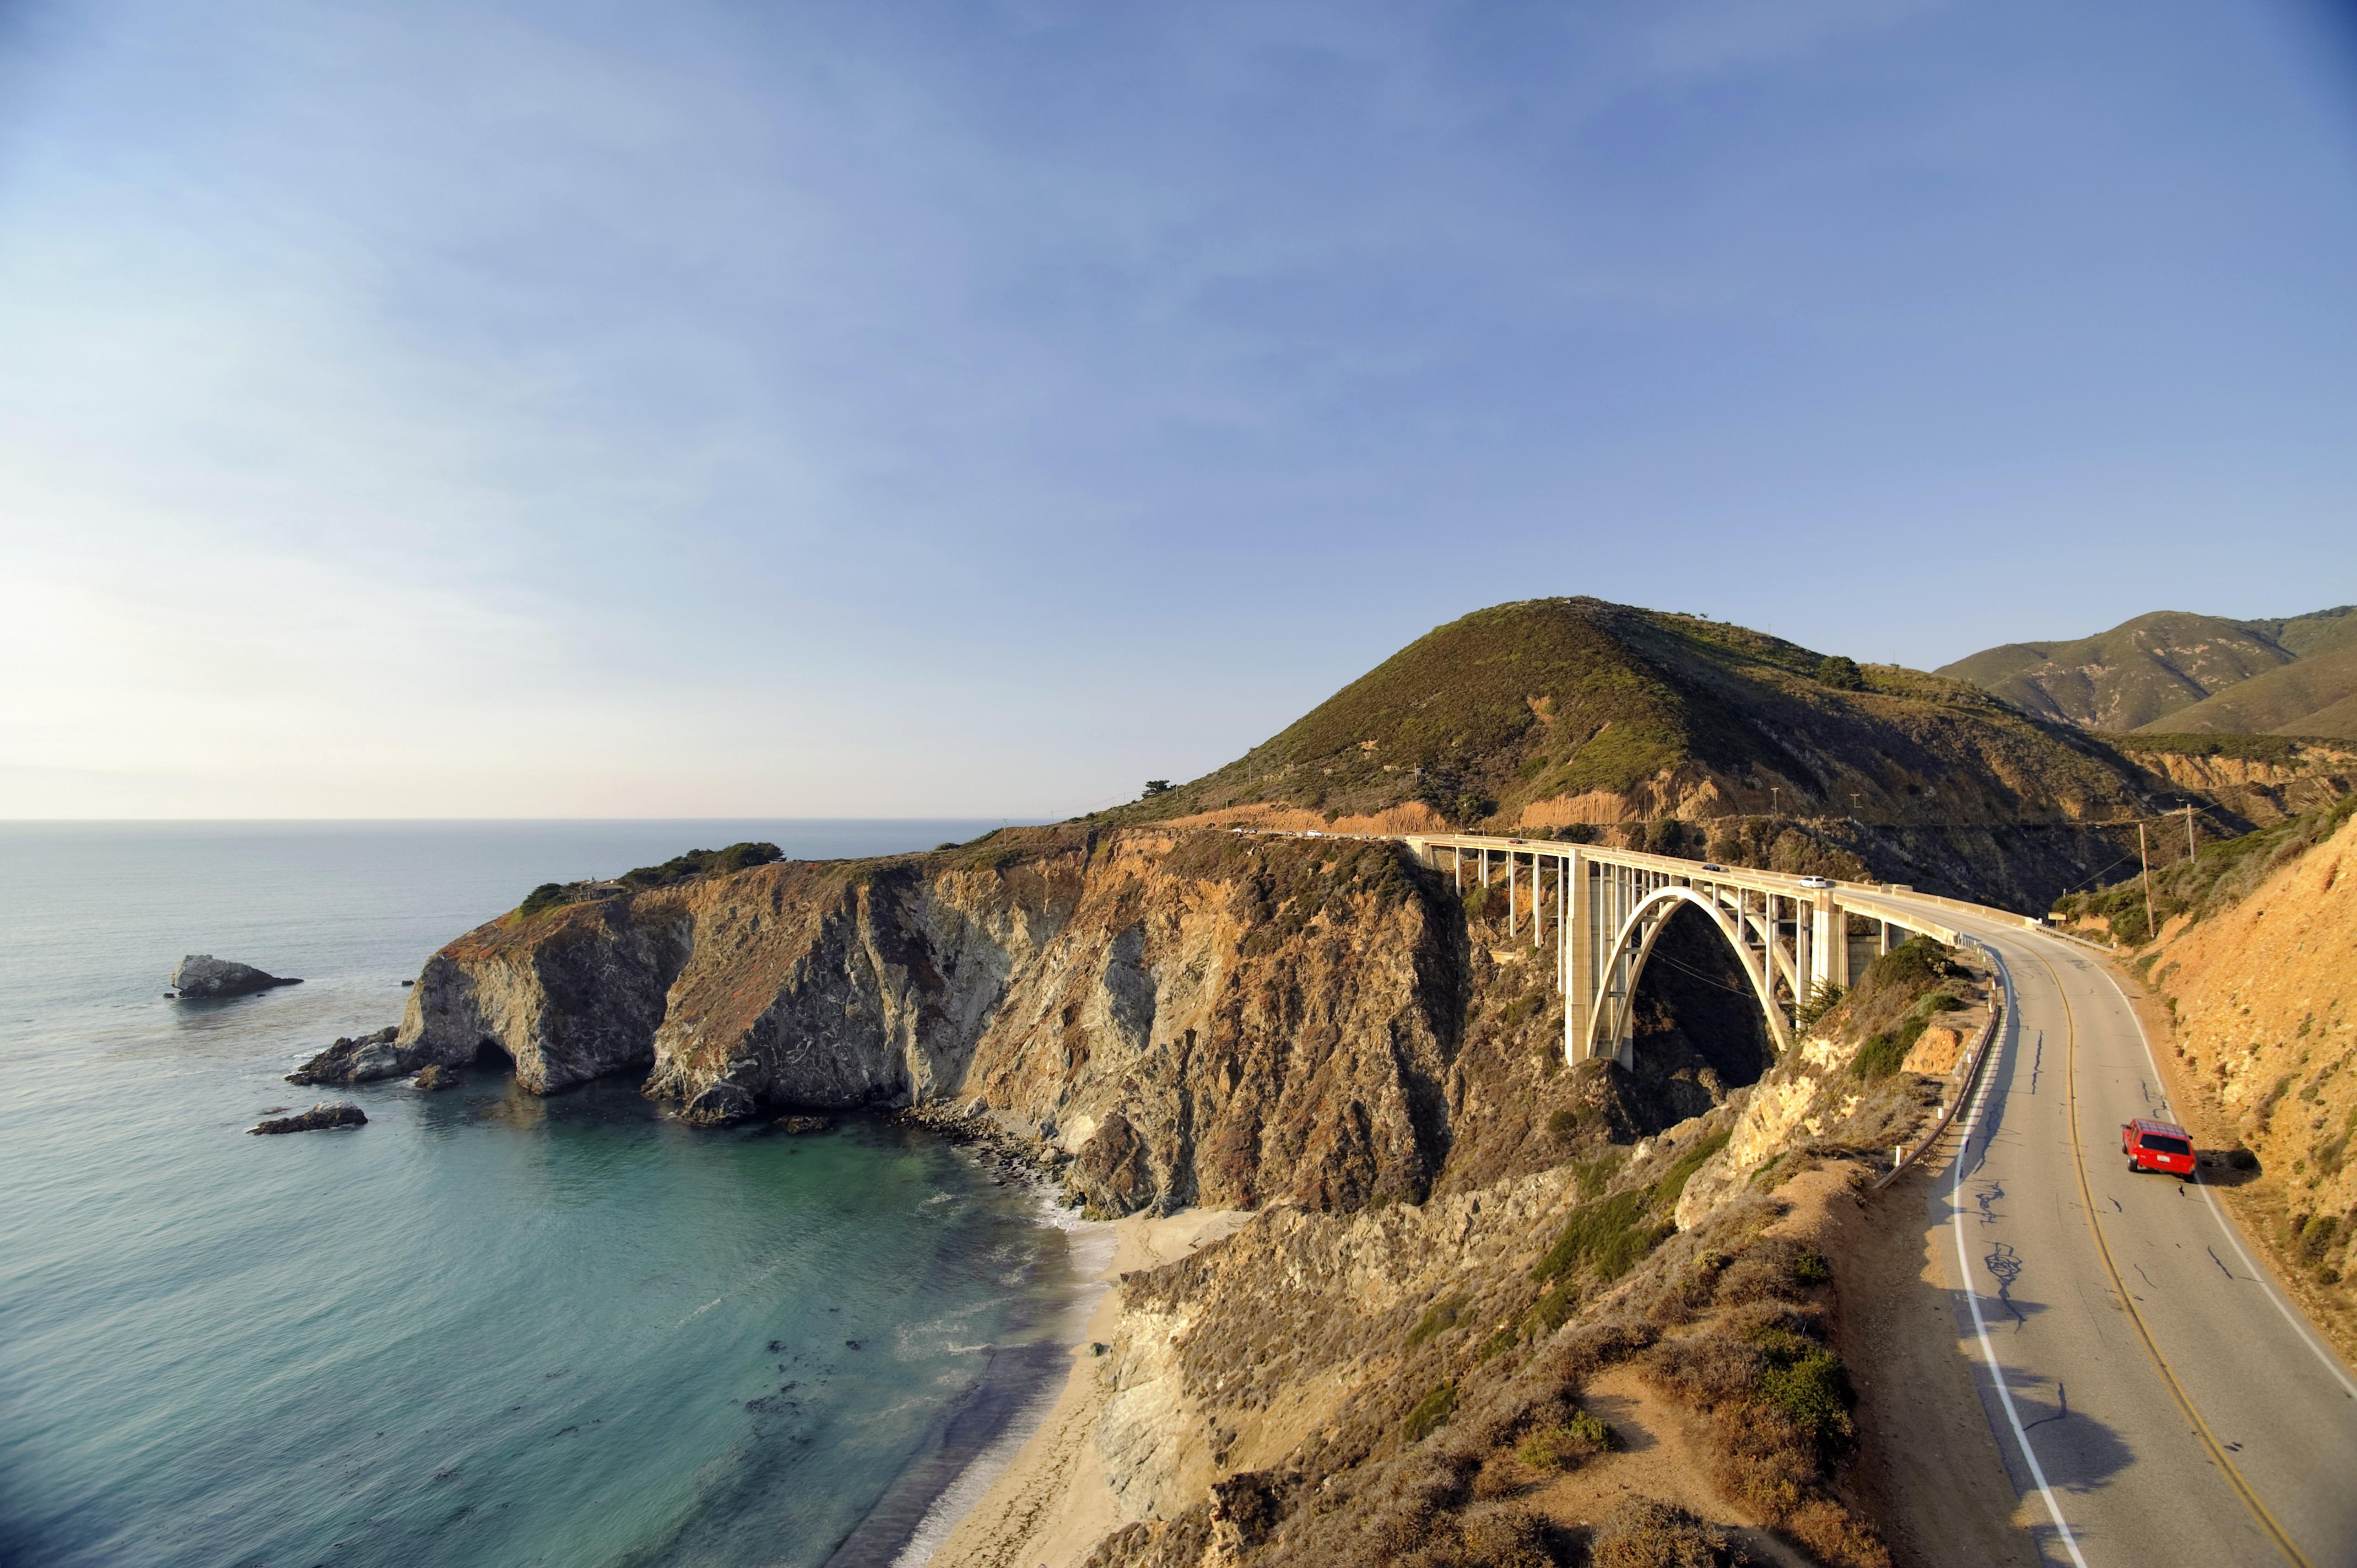 USA, California, Big Sur Pacific Coastline, Bixby Bridge and Highway 1